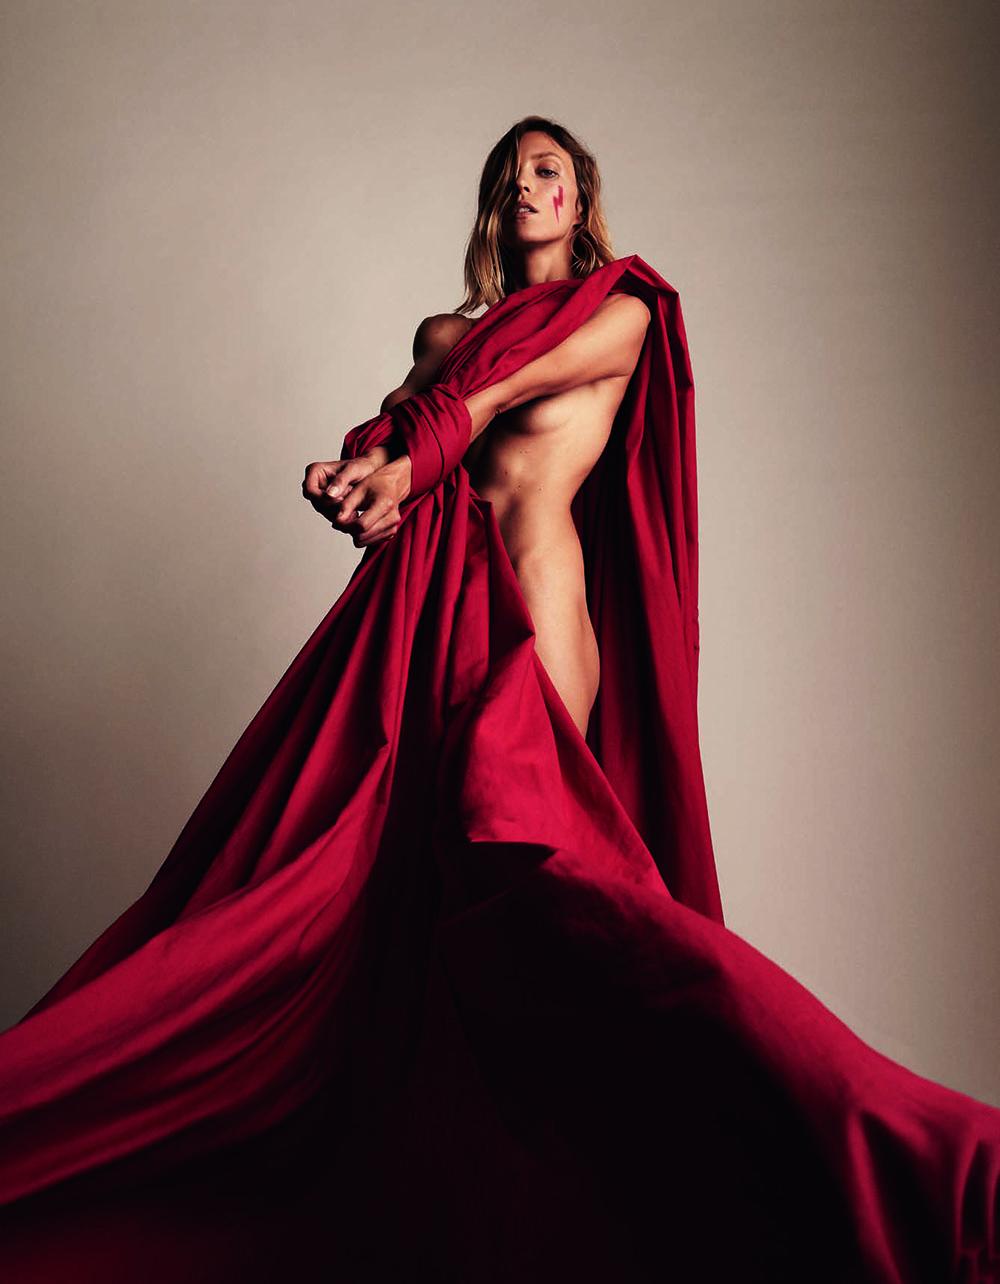 Anja Rubik covers Vogue Poland December 2020 by Anja Rubik